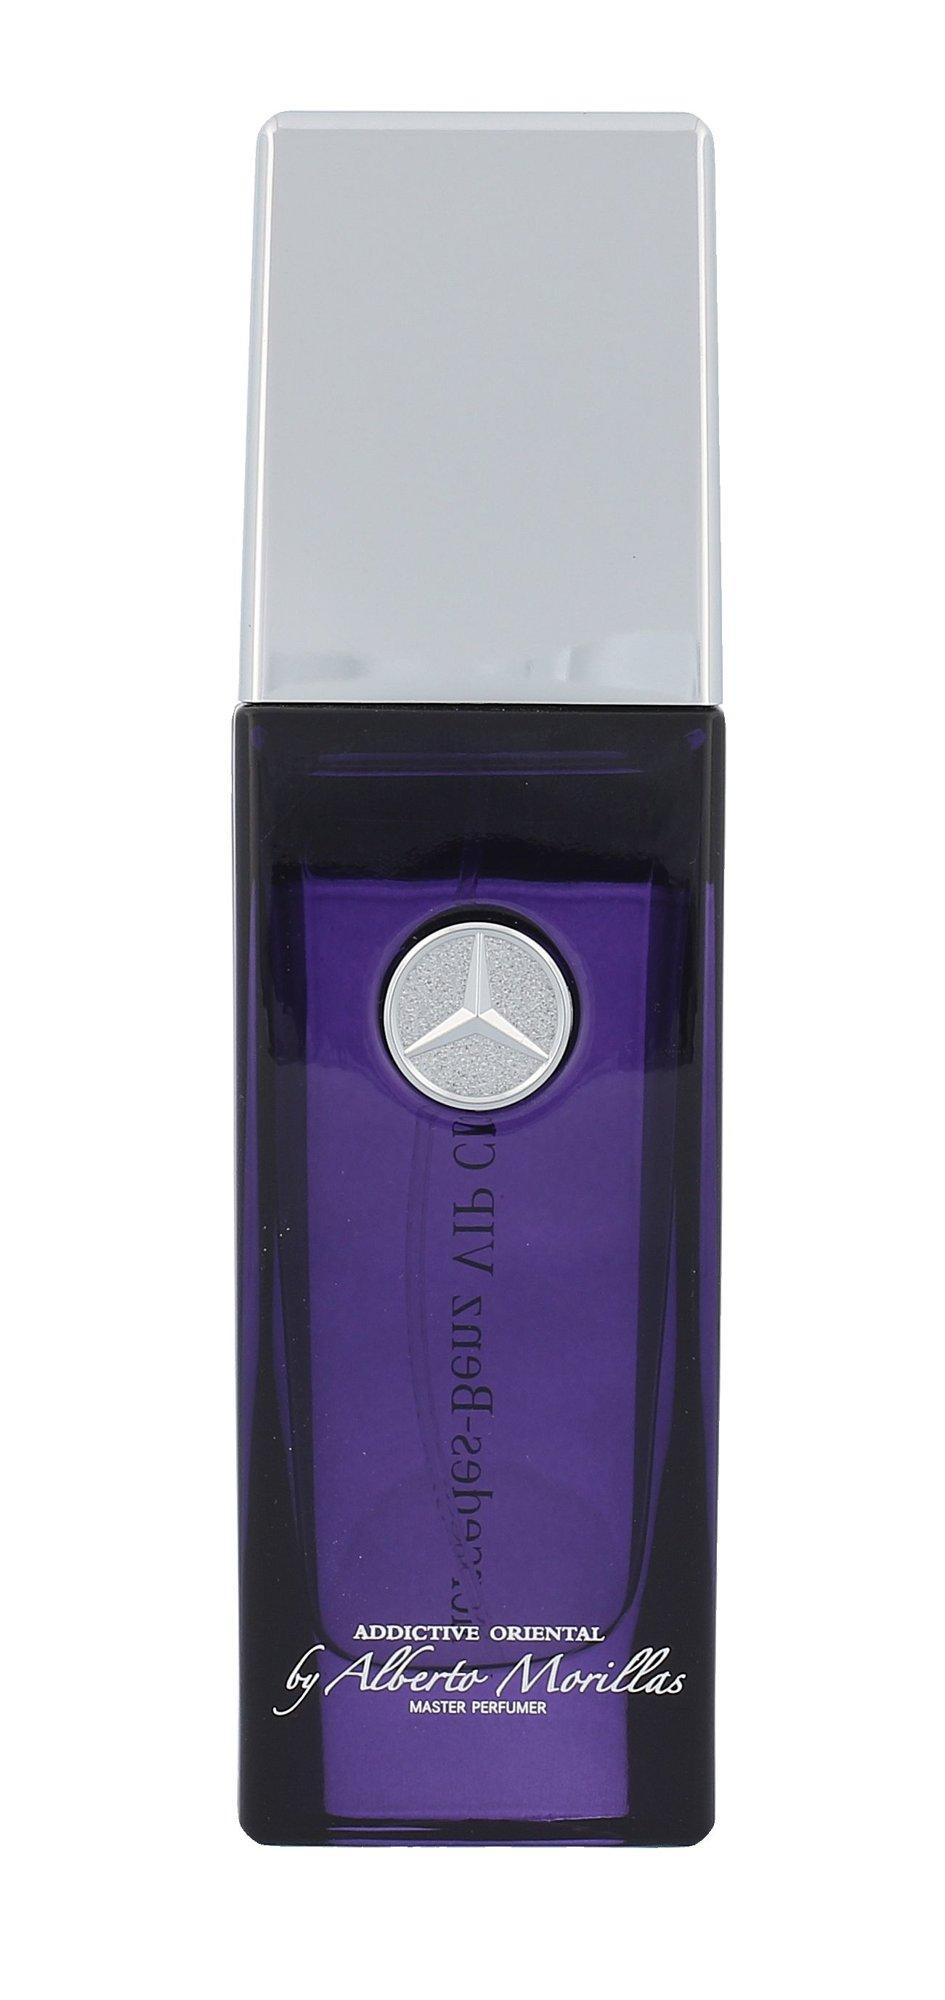 Mercedes-Benz Vip Club Addictive Oriental by Alberto Morillas EDT 50ml